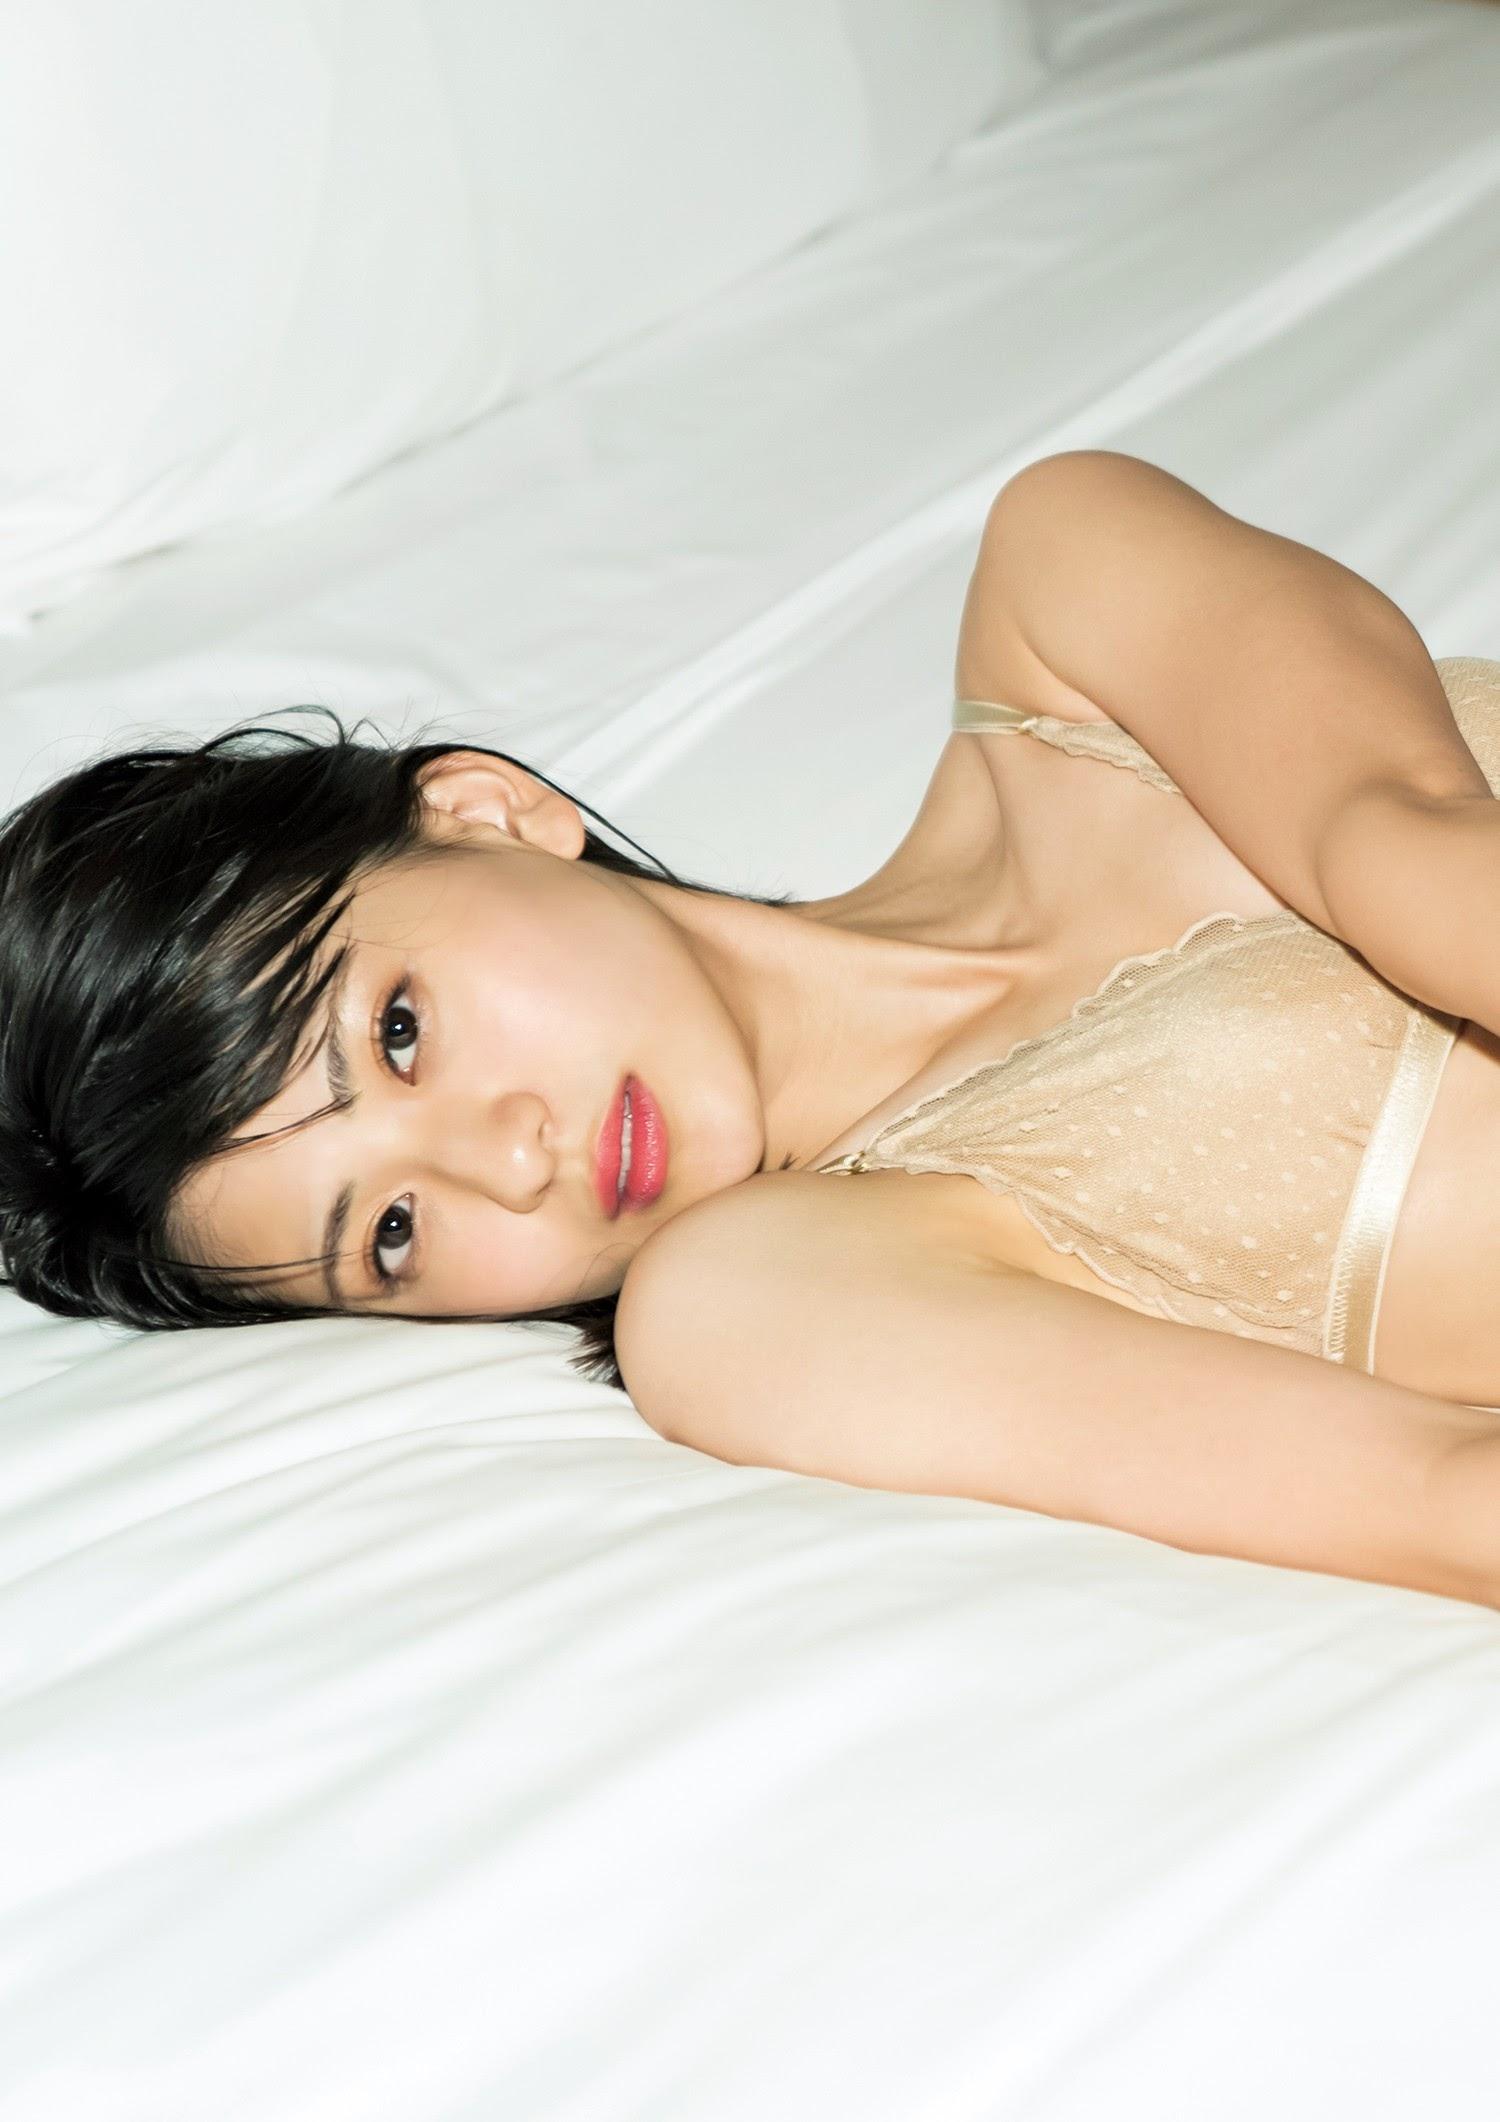 nanami yamada 2020094